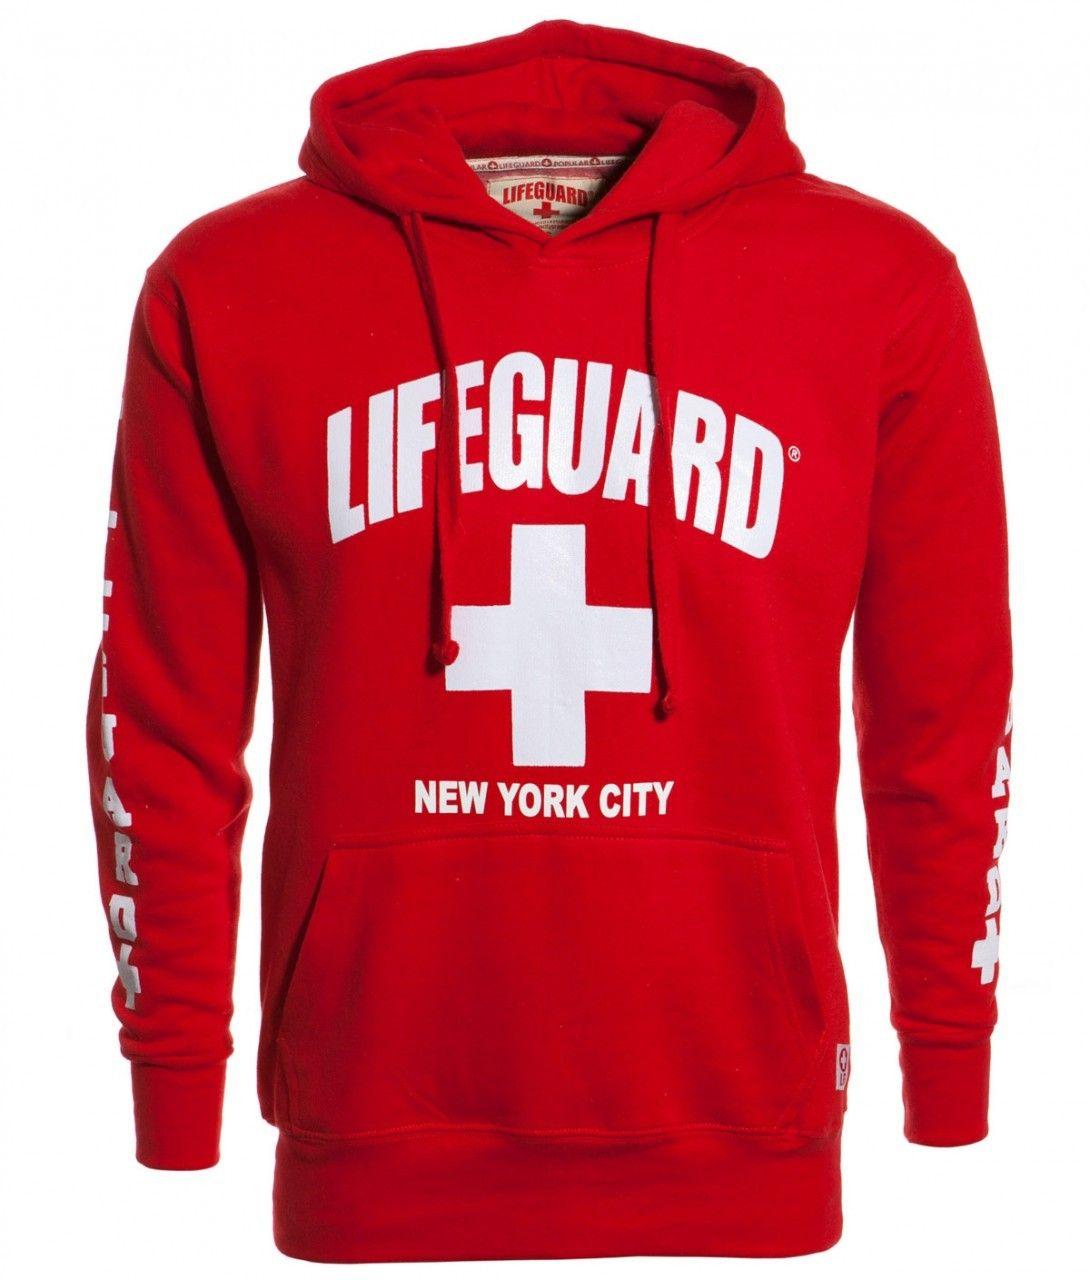 97af0d9fd3039 GrandSlamNewYork.com - LIFEGUARD New York City Red Hoodie